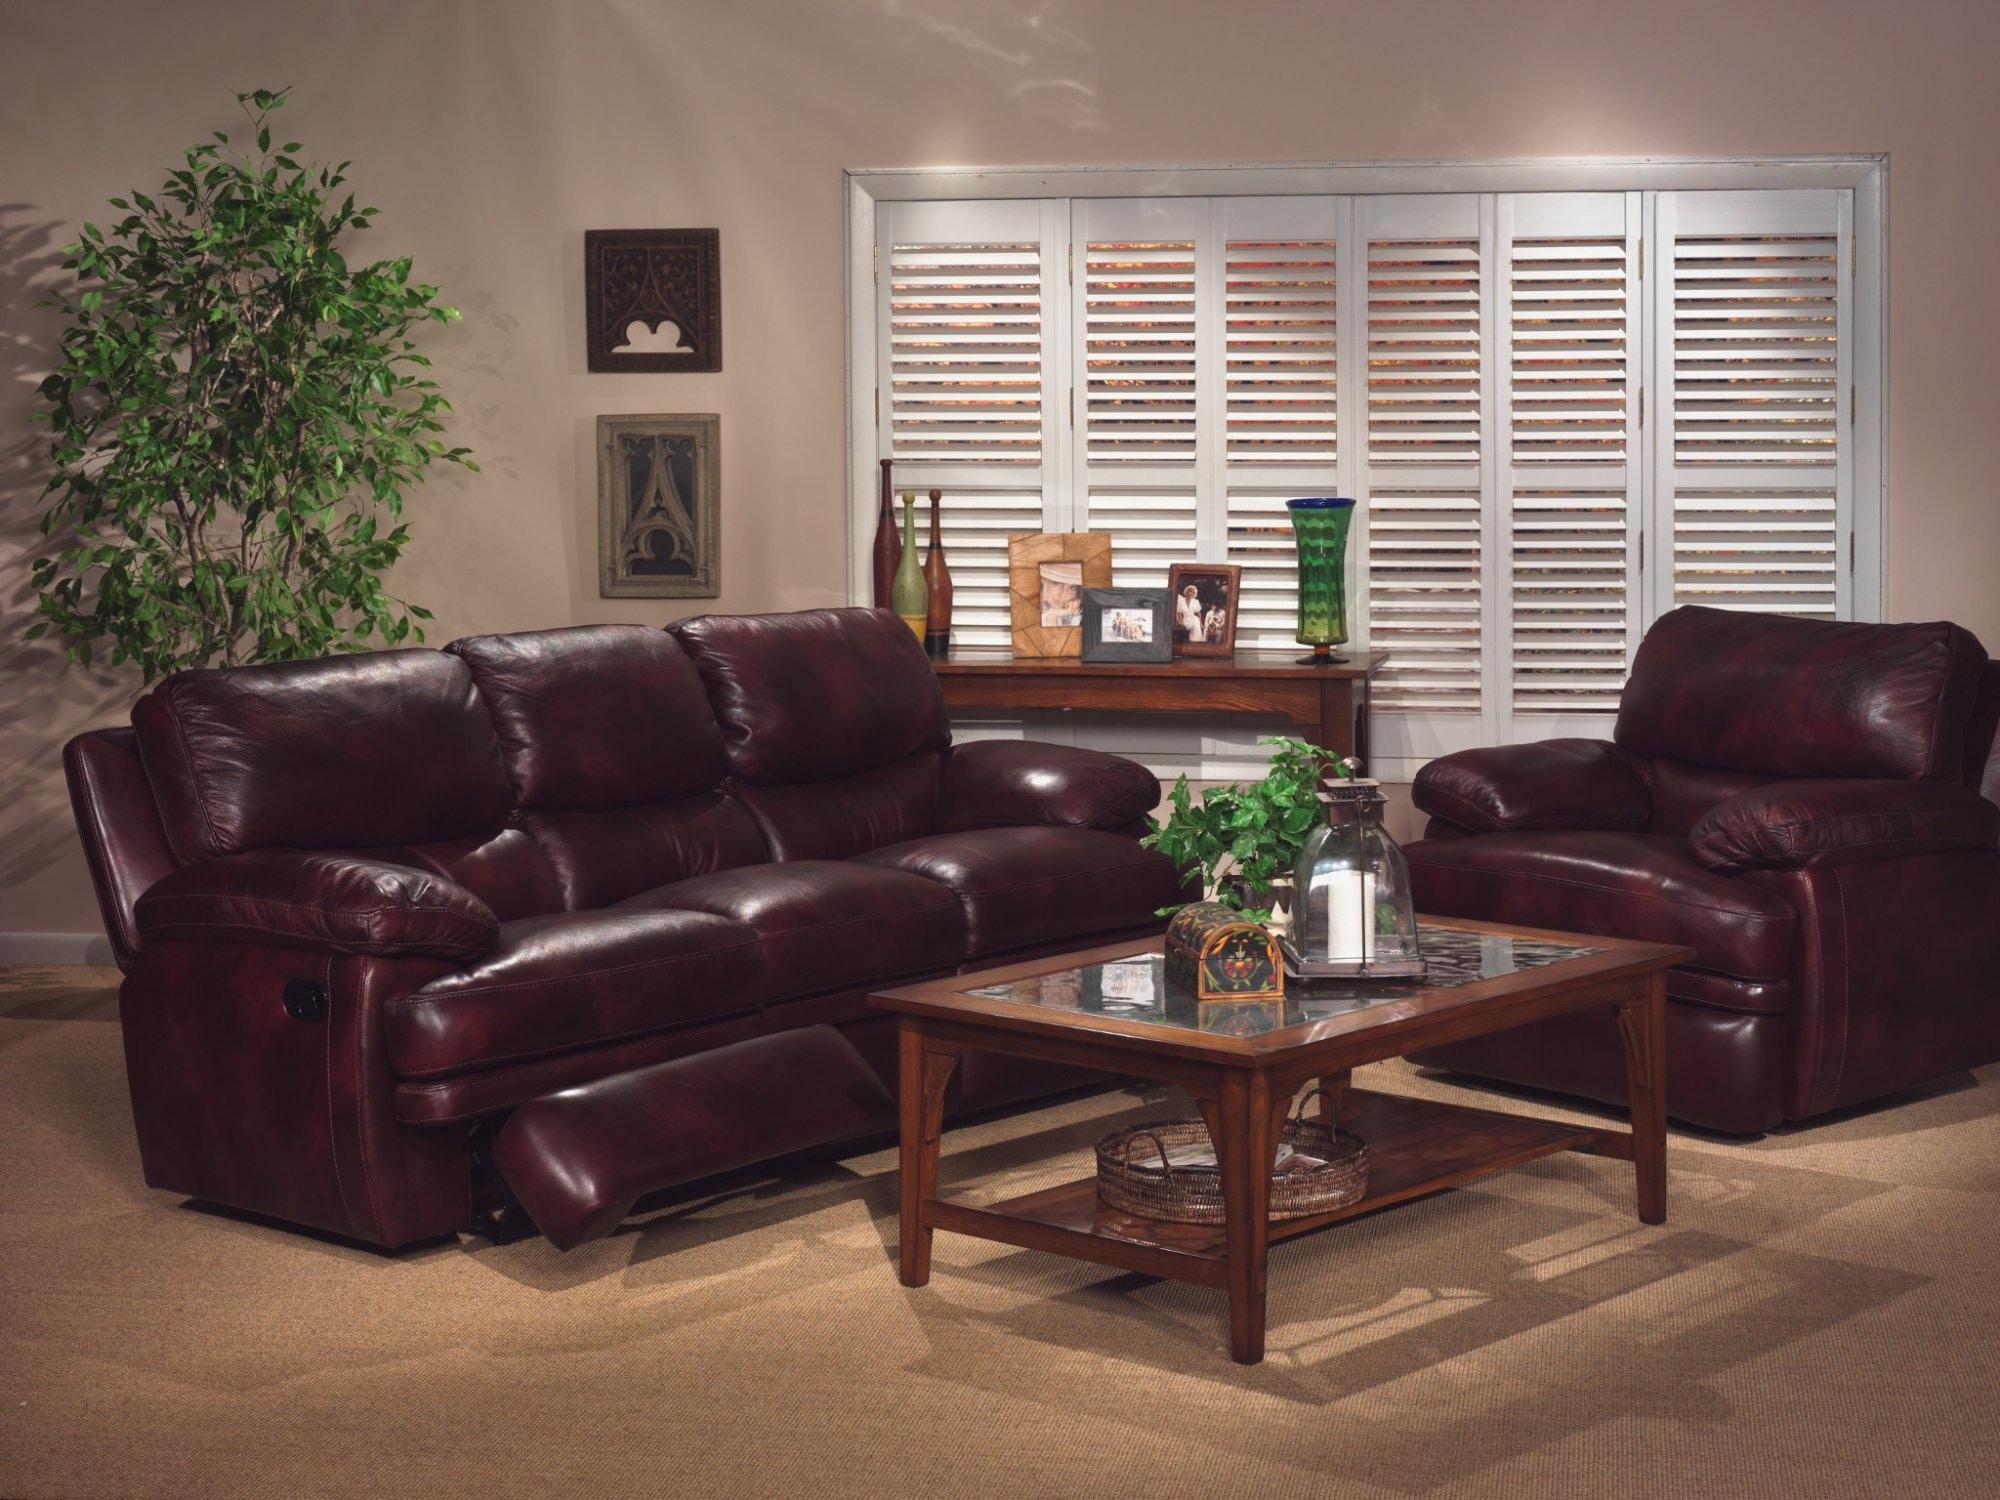 flexsteel sofa sets black leather loveseat sleeper furniture slone brothers longwood and orlando fl 1127 62 reclining